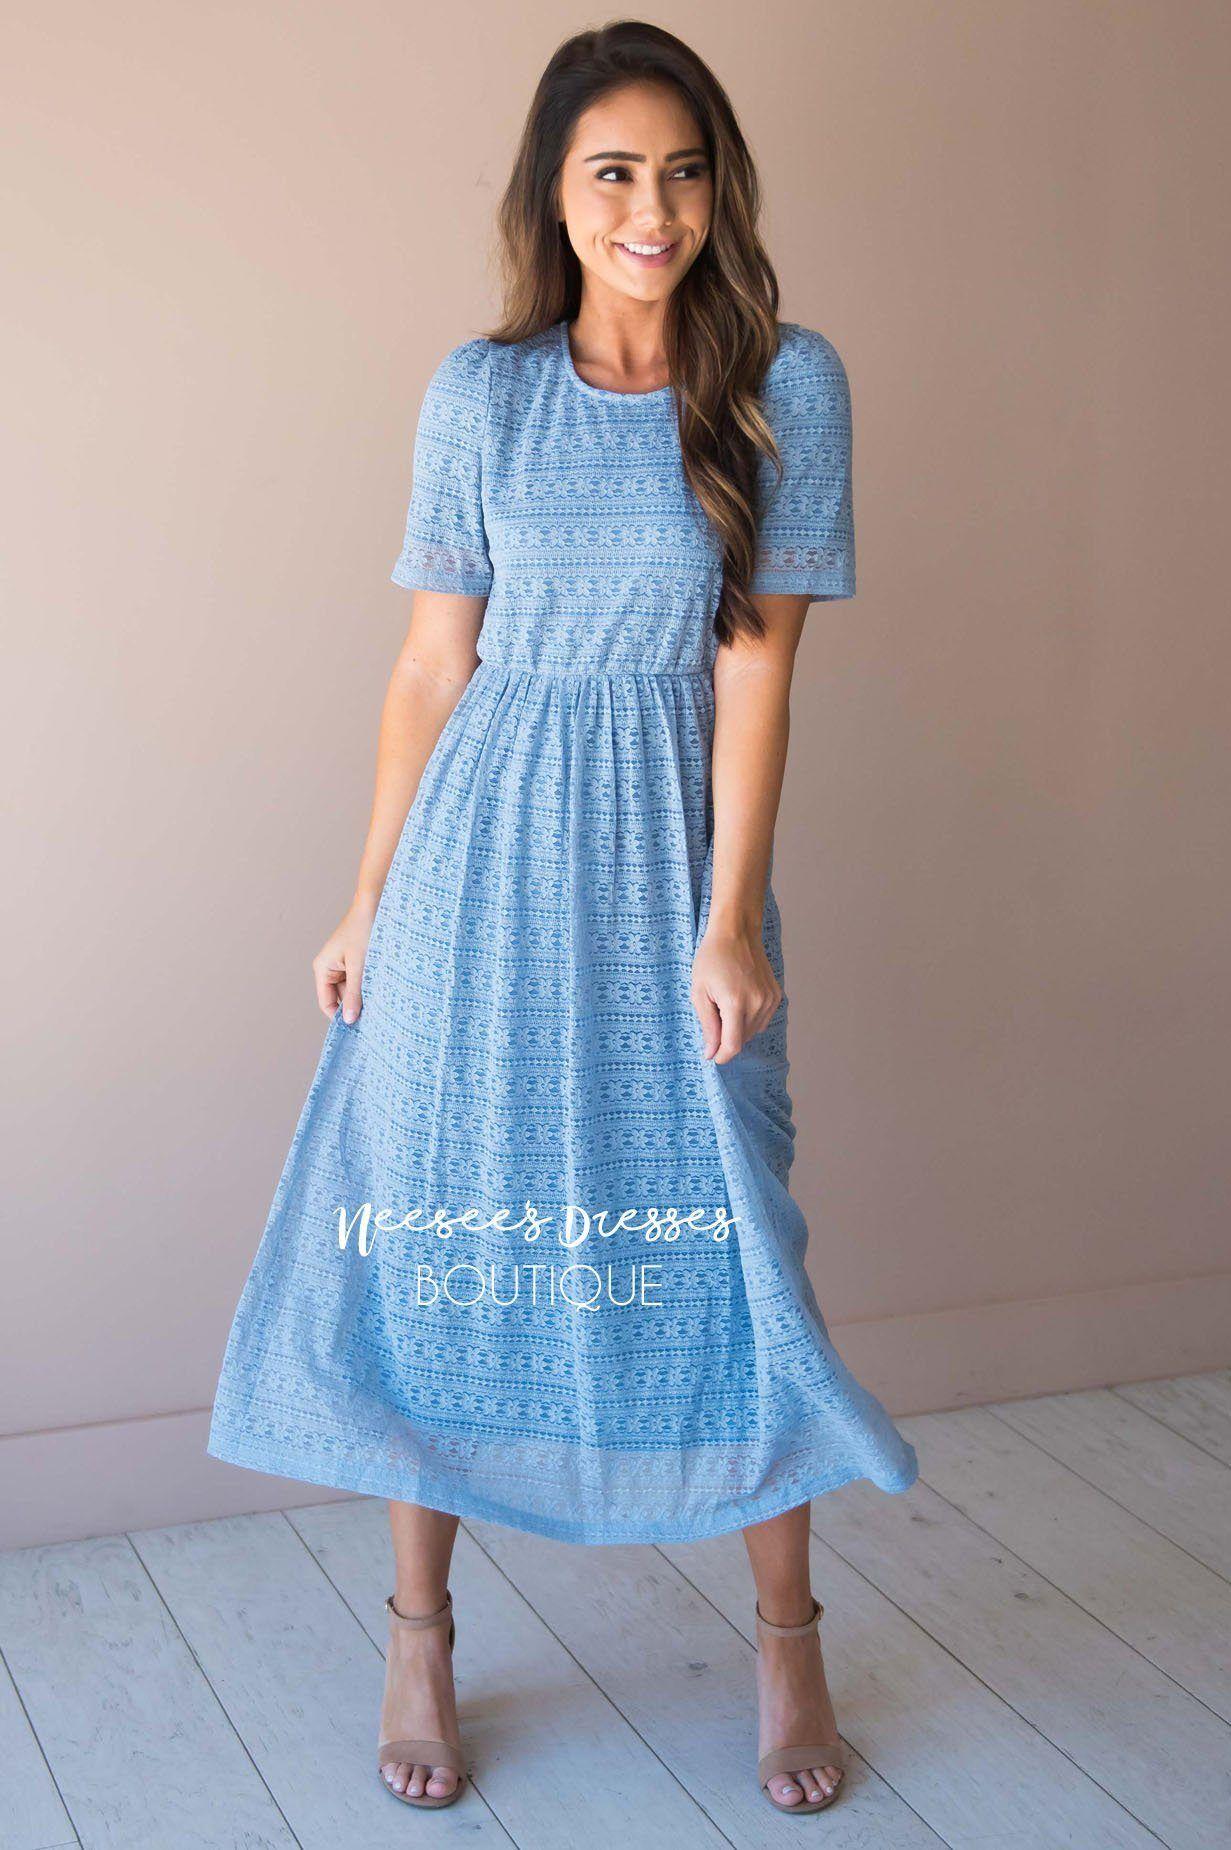 Light Blue Floral Lace Modest Church Dress Best And Affordable Modest Boutique Cute Modest Dresses And Neesees Dresses Modest Spring Dresses Modest Dresses [ 1850 x 1231 Pixel ]